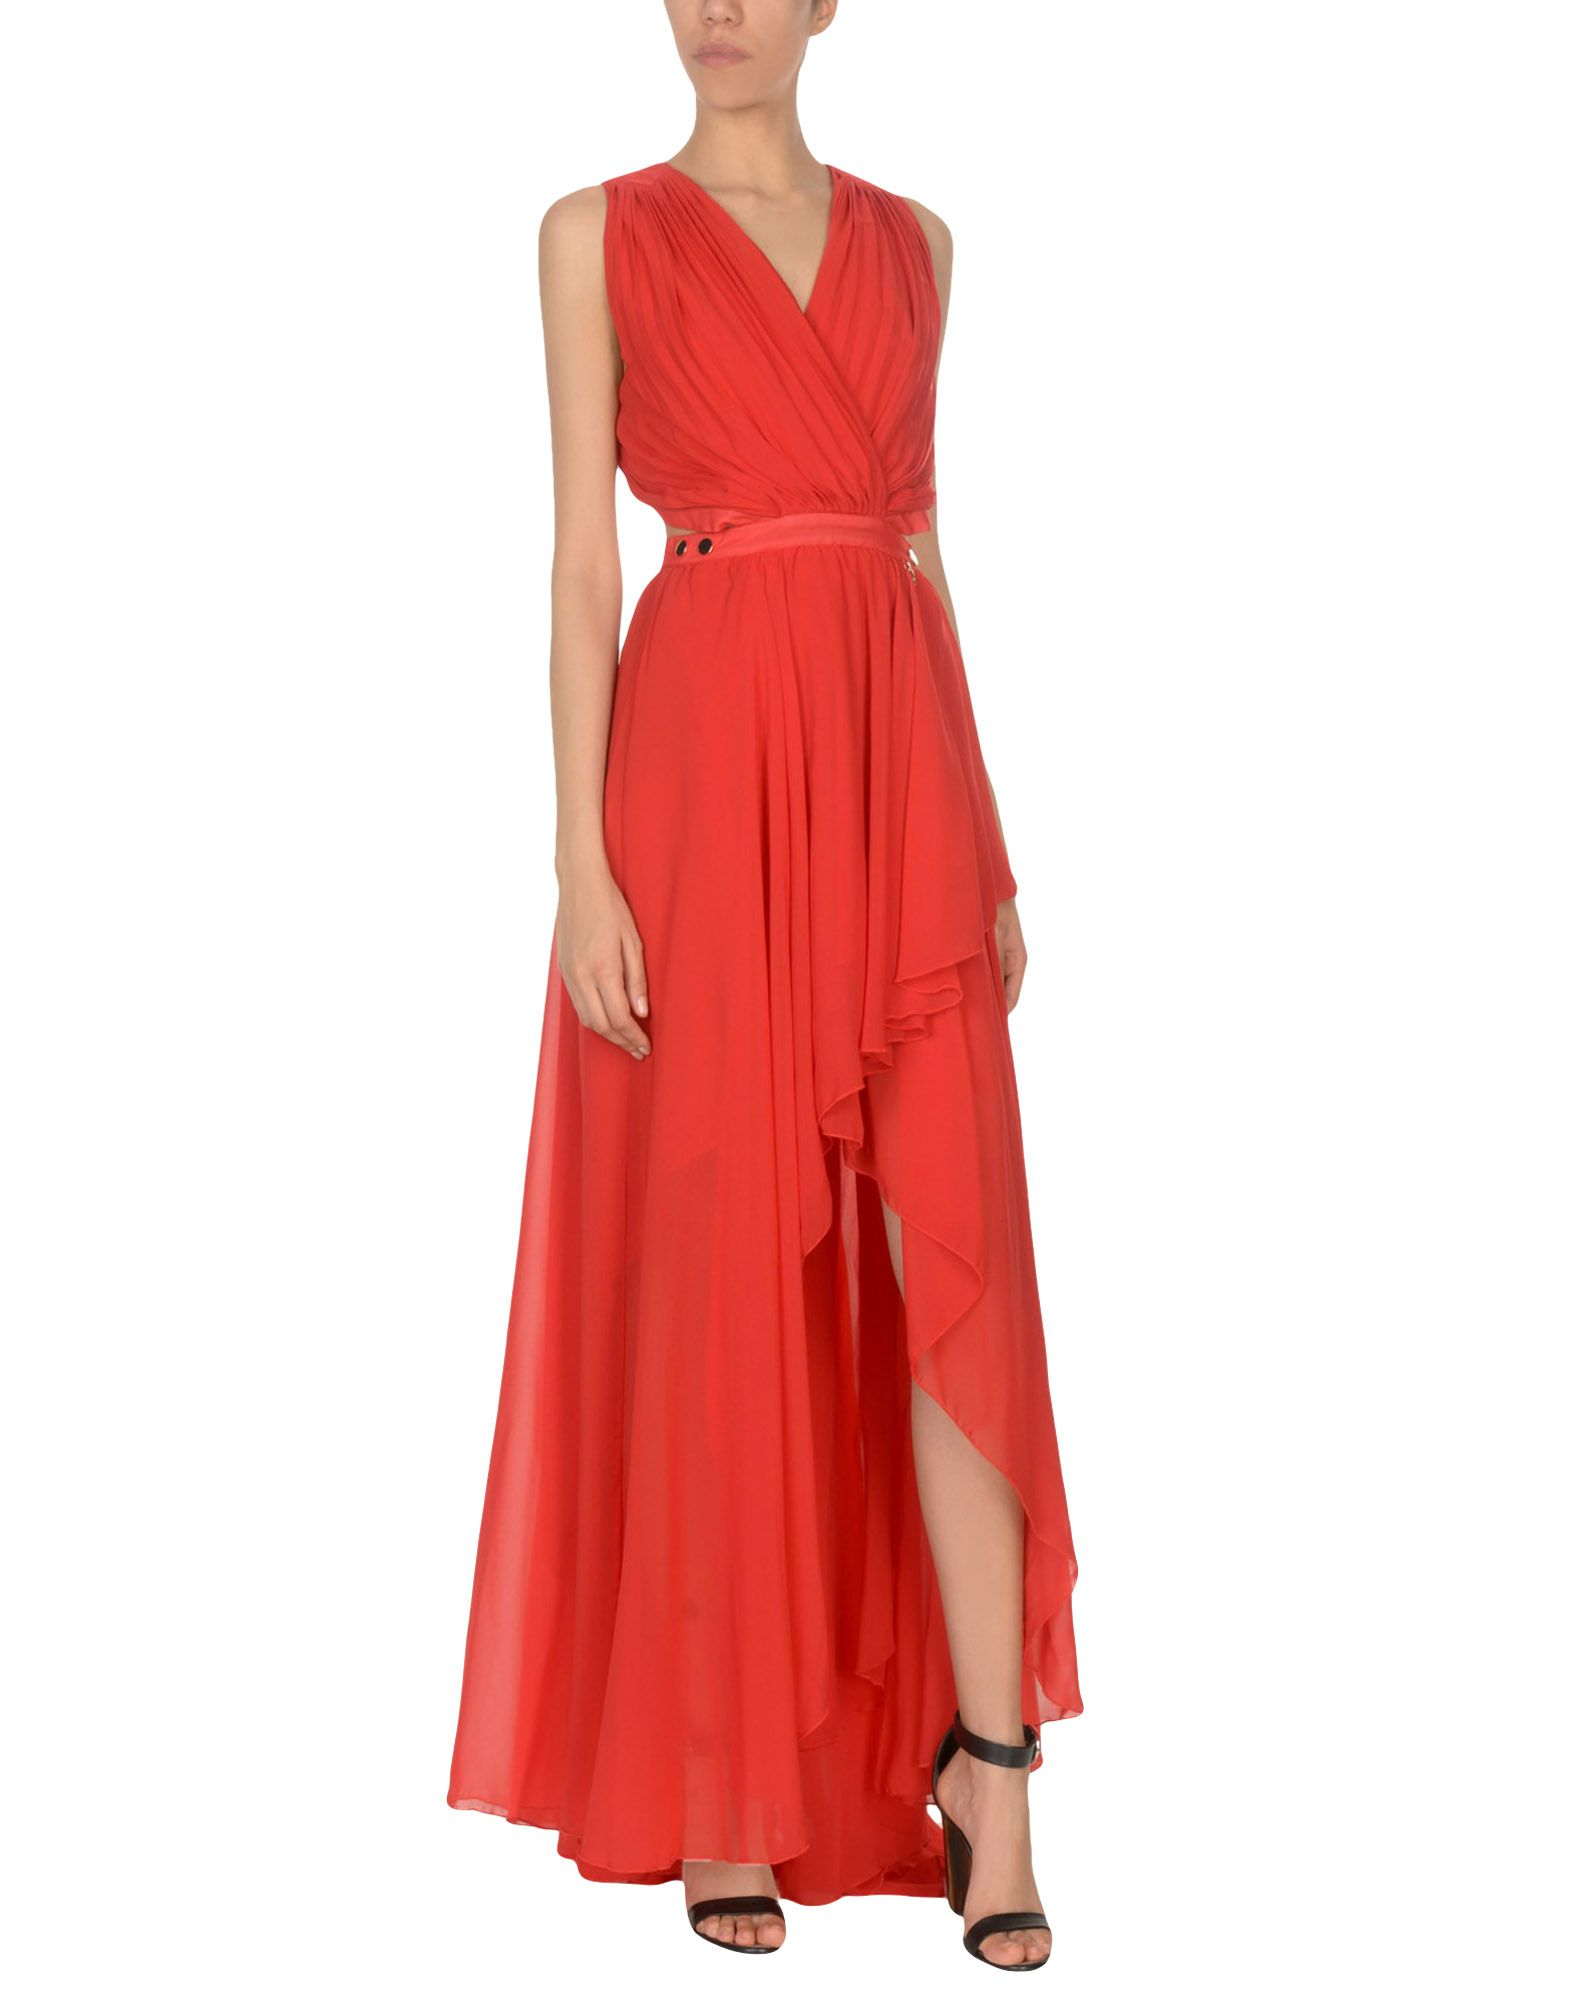 MANGANO Платье длиной 3/4 tenax платье длиной 3 4